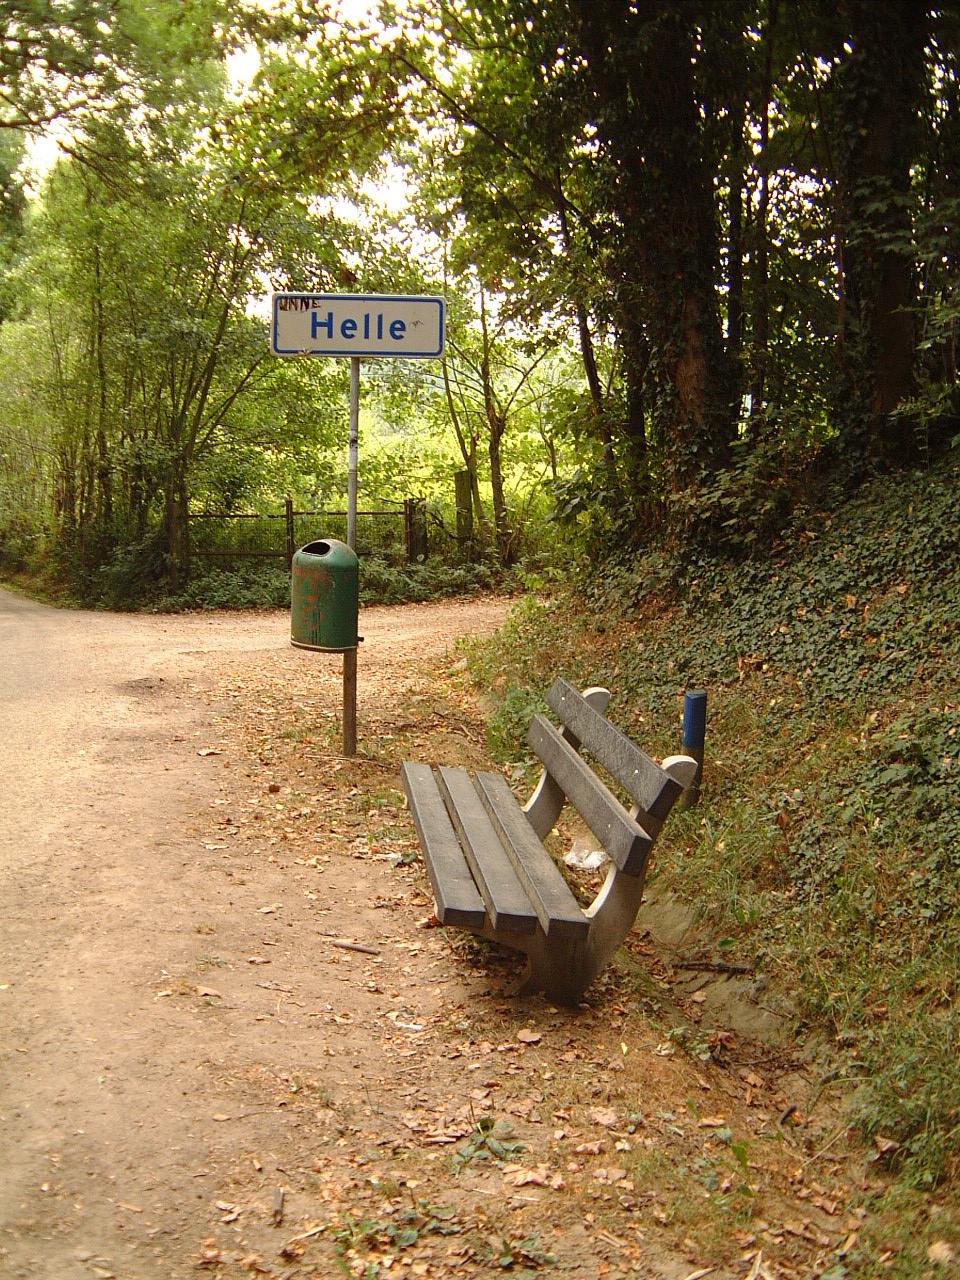 objects signs hell on earth helle wastebin dustbin bench landscapes forrest path